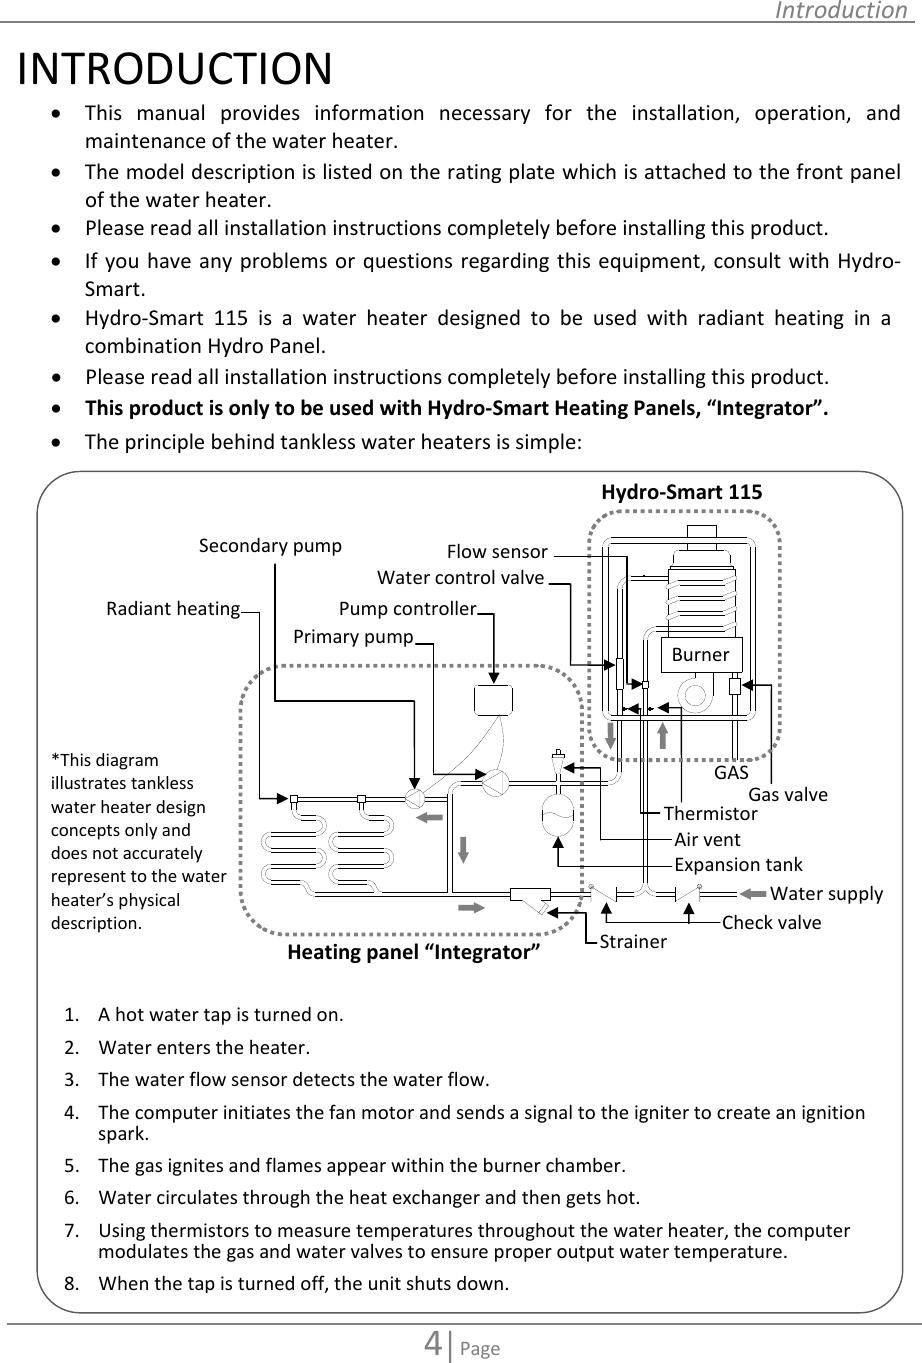 Hydro Smart 115 Installation Manual ManualsLib Makes It Easy ... on